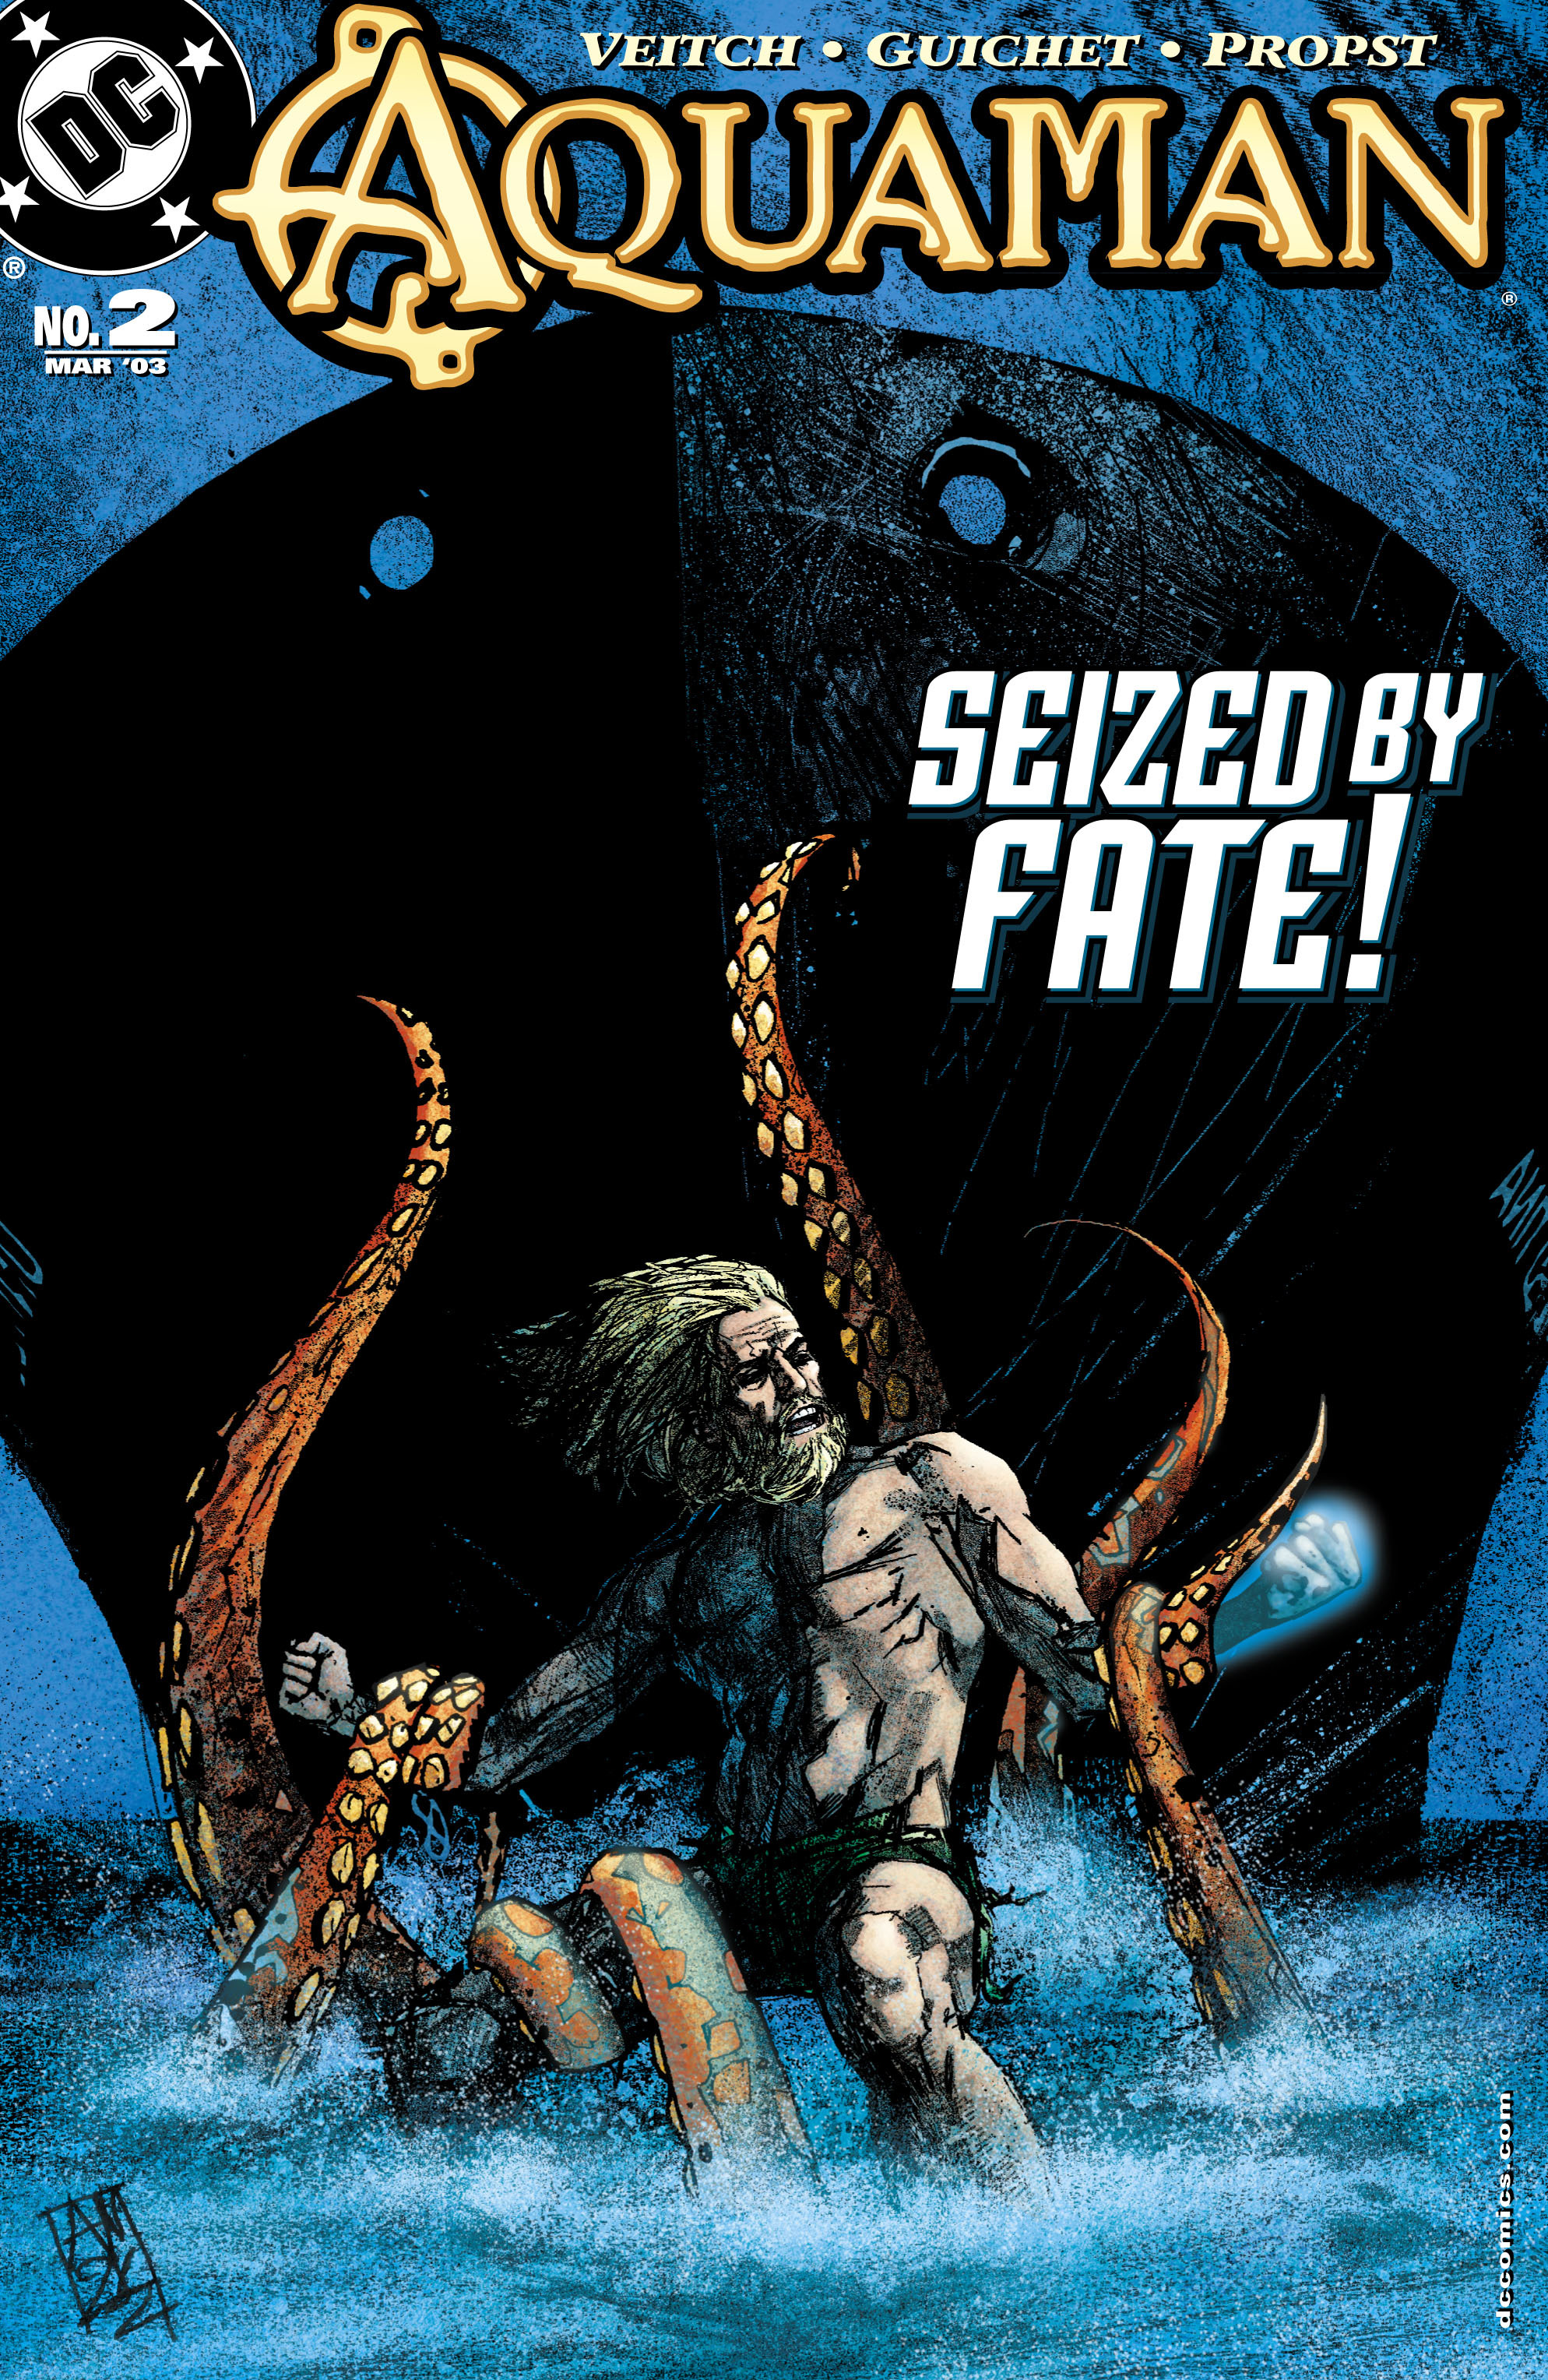 Read online Aquaman (2003) comic -  Issue #2 - 1